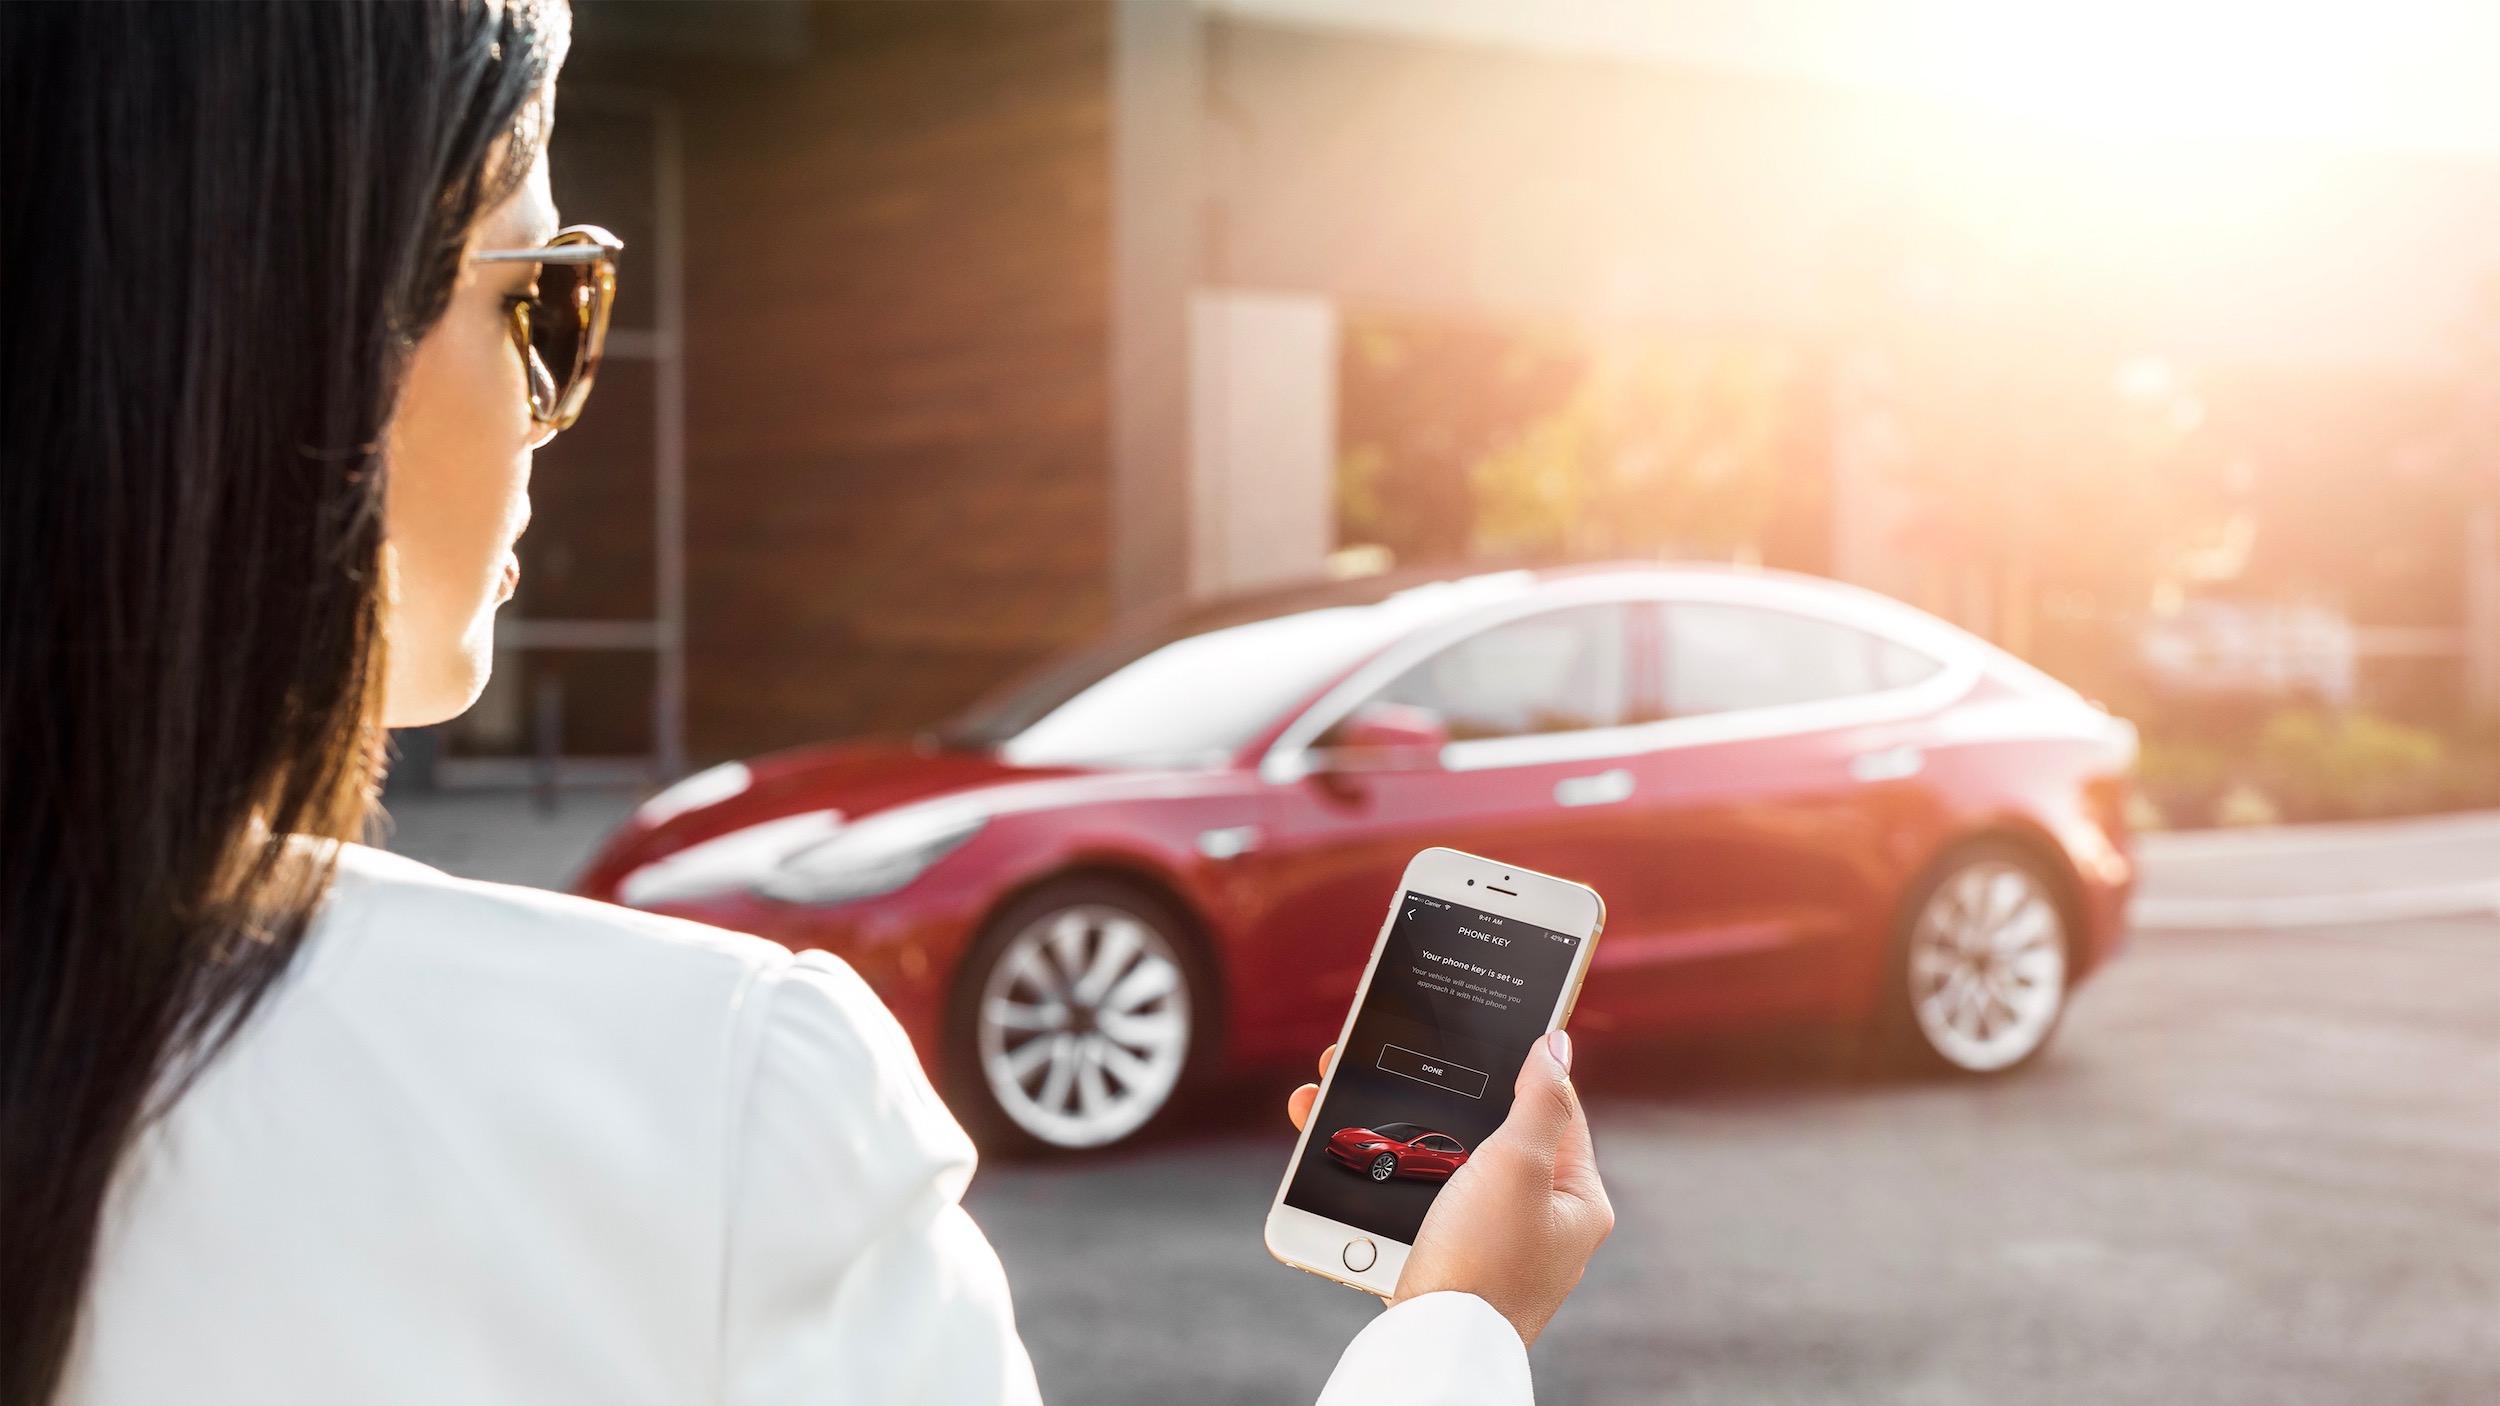 Model 3 – My Tesla Phone App as Key